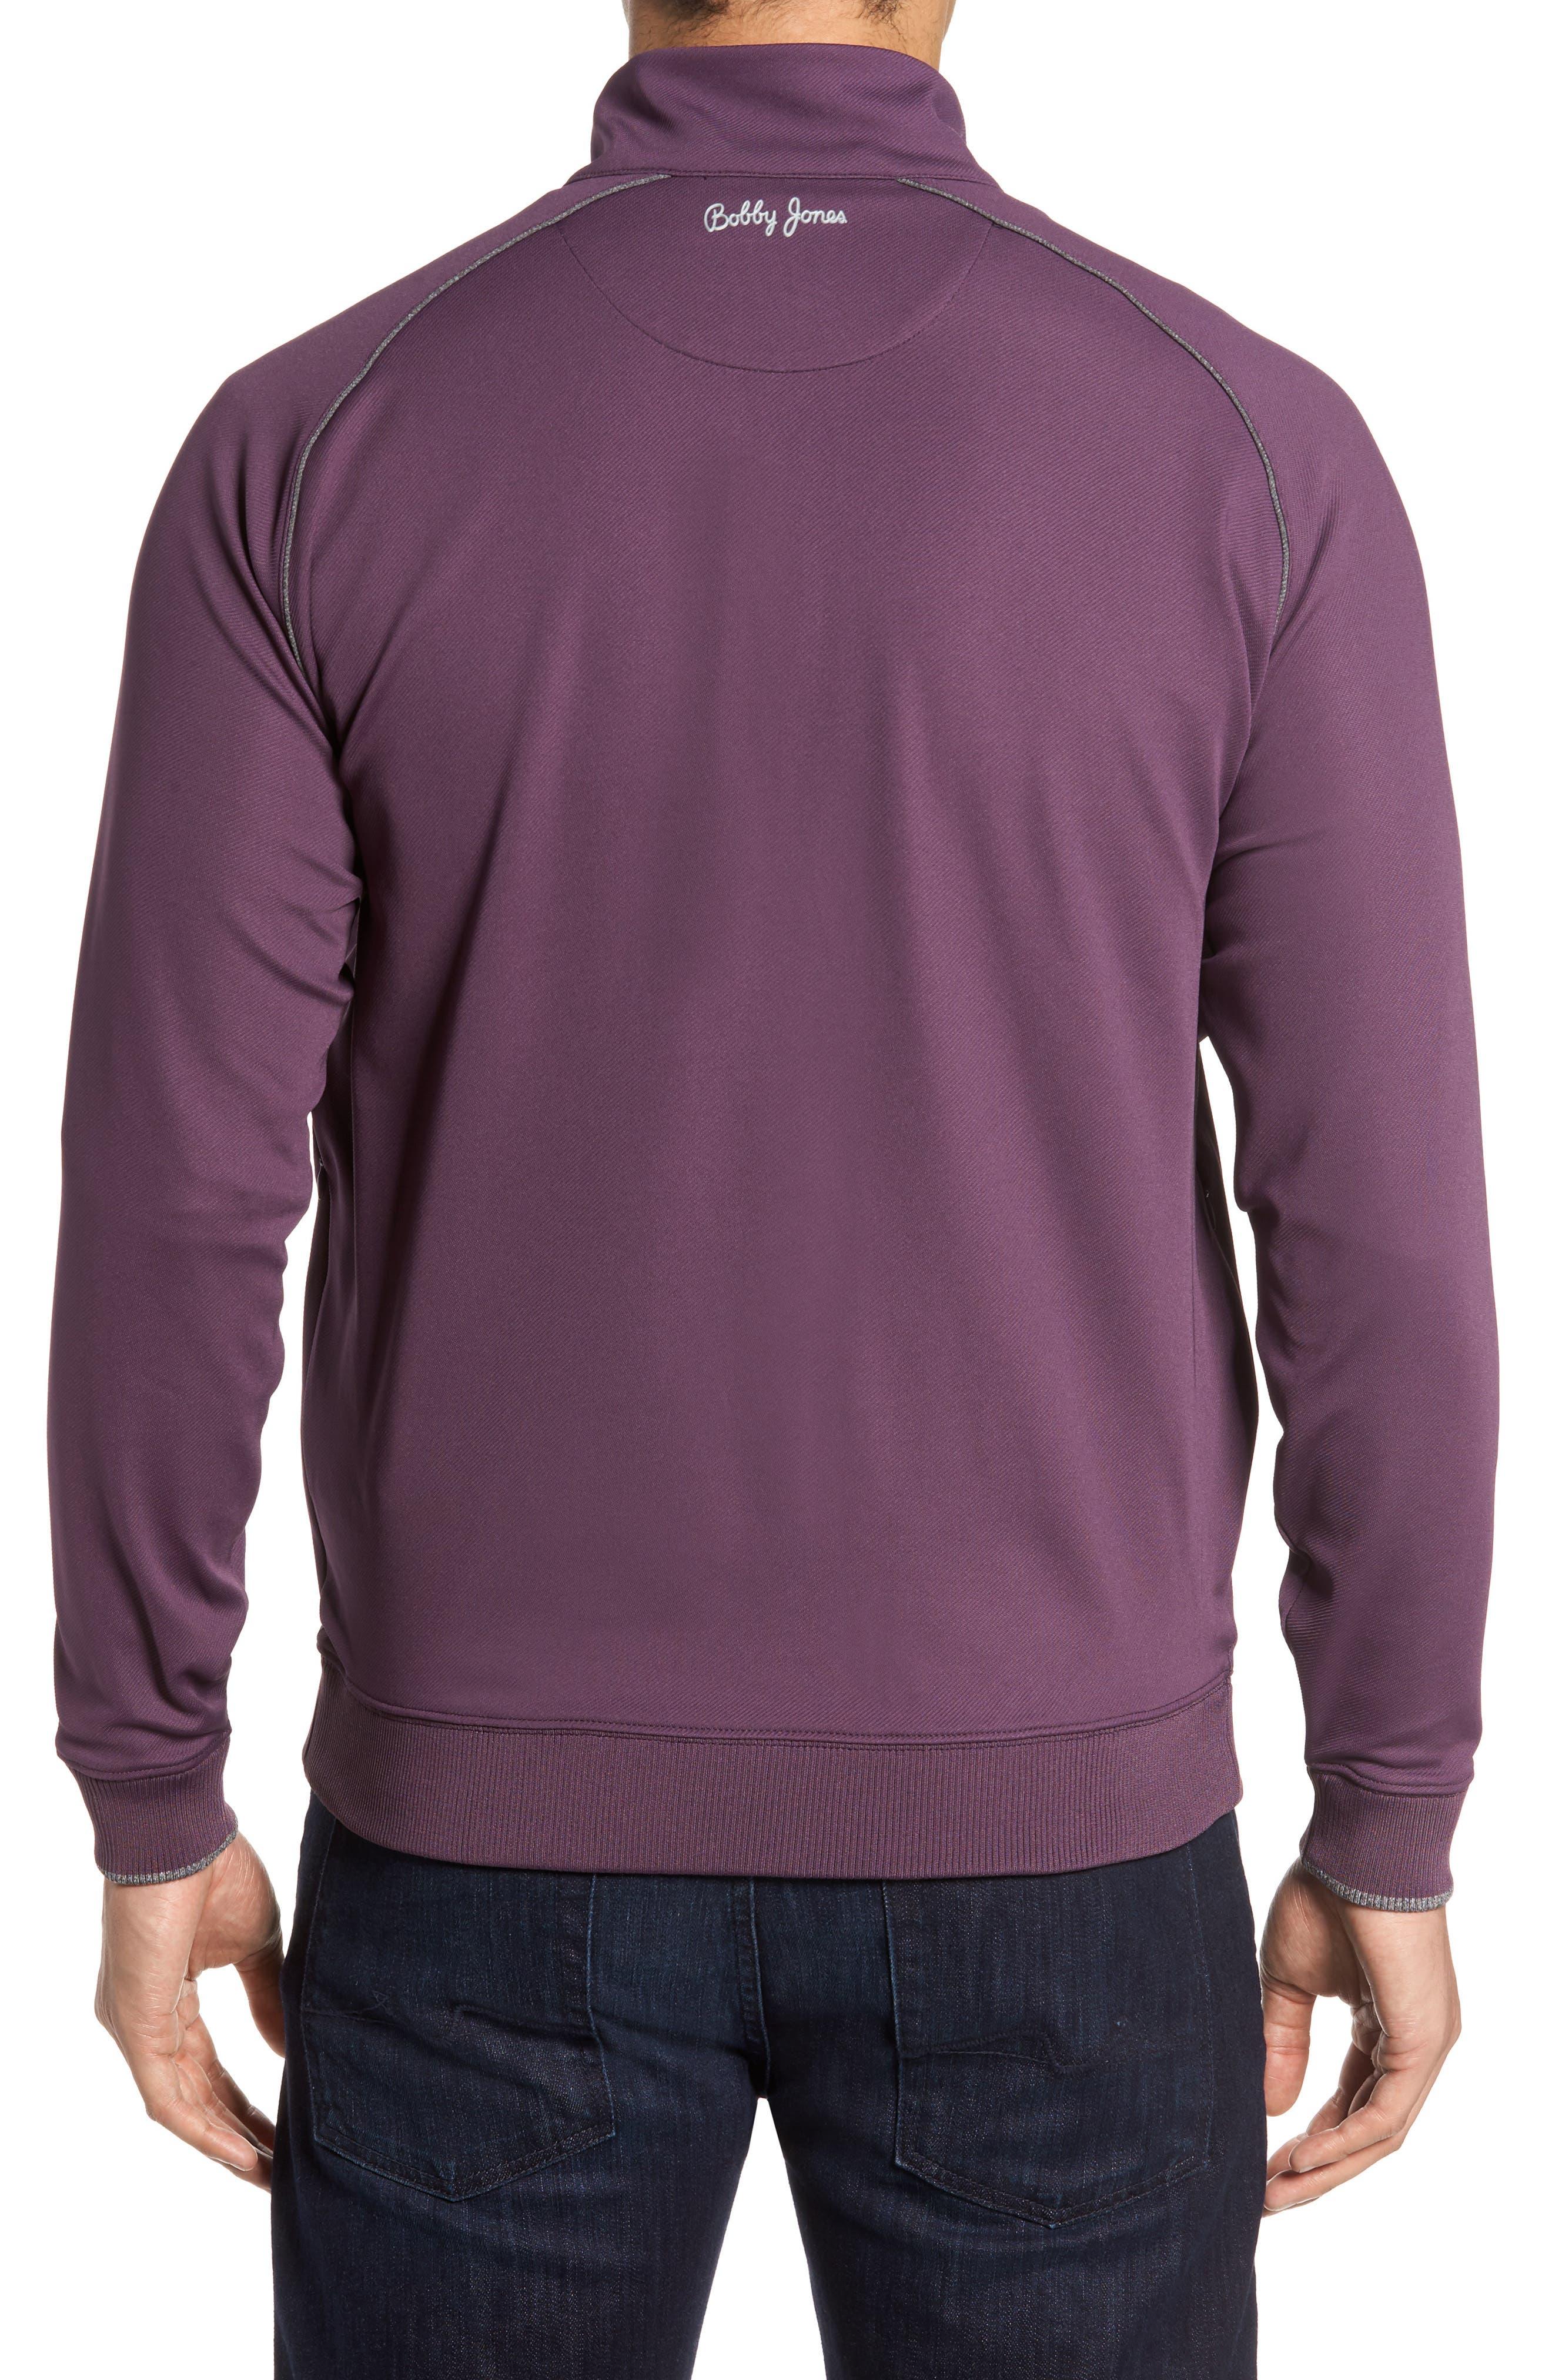 XH20 Banded Bottom Pullover,                             Alternate thumbnail 2, color,                             Blackberry